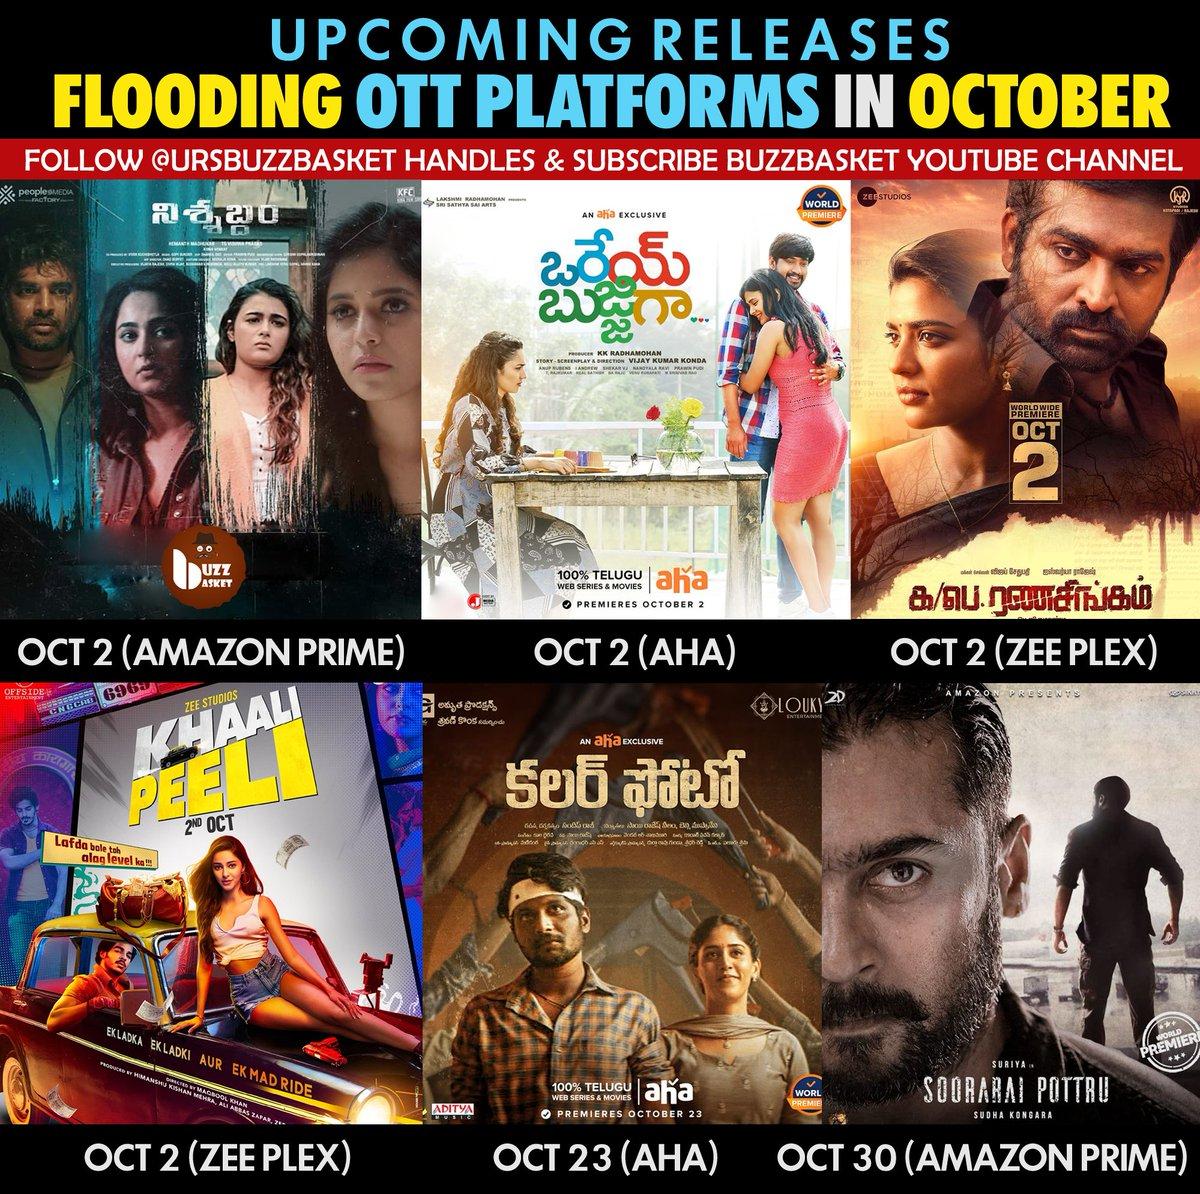 Upcoming Movies in OTT (October) #AnushkaShetty #Nishabdham #RajTarun #MalavikaNair #OreyBujjiga #AishwaryaRajessh #VijaySethupathi #KaPaeRanasingam #AnanyaPandey #KhaaliPeeli  #ChandiniChowdary #ColourPhoto #Suriya #SooraraiPottru #AakasamNeeHaddhuRa https://t.co/FPH9tAsjFN